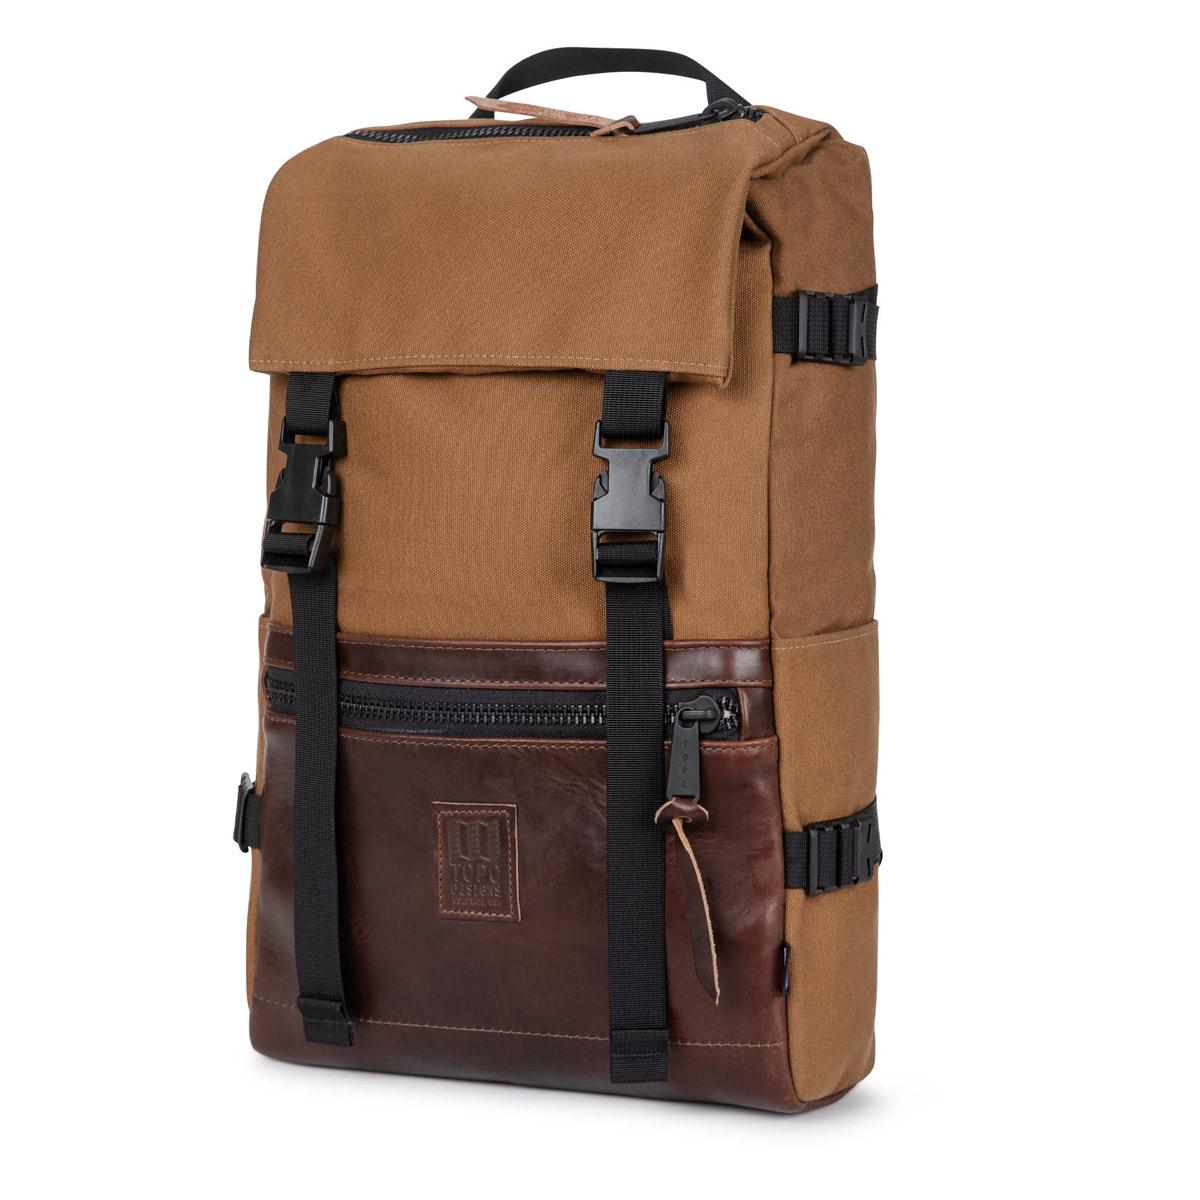 Topo Designs Rover Pack Heritage Dark Khaki Canvas/Brown Leather